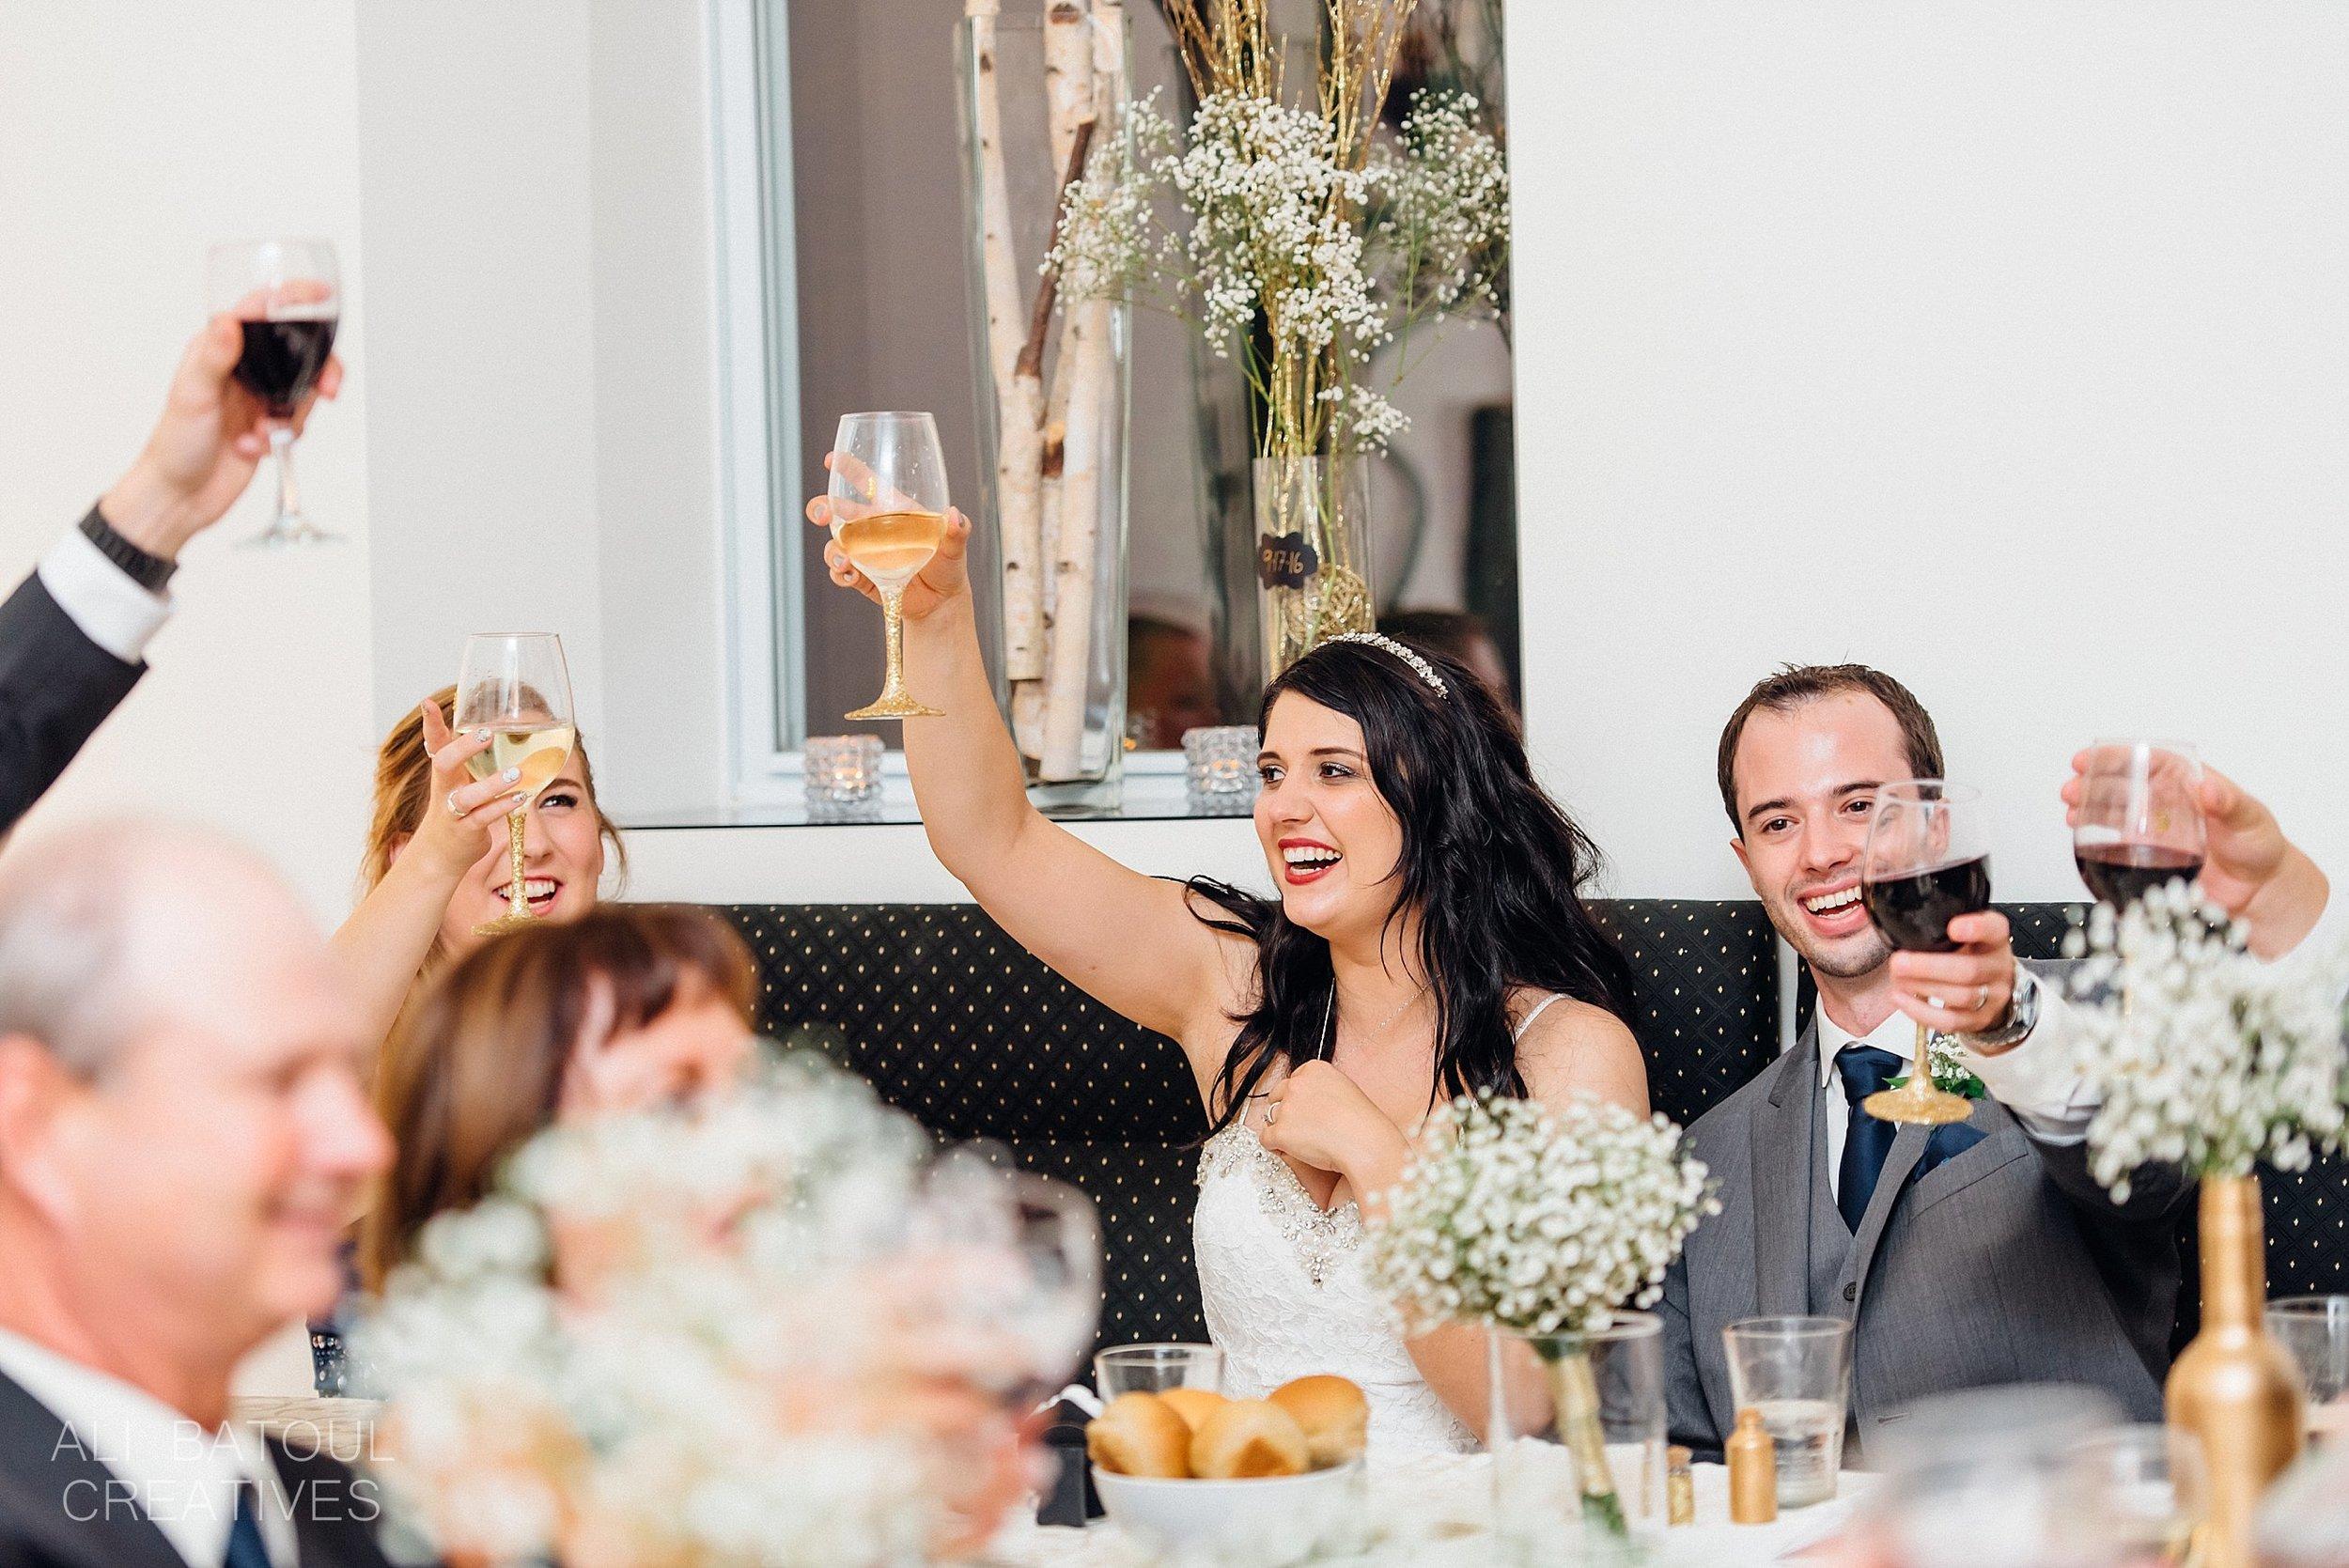 Jocelyn + Steve At The Schoolhouse Wedding - Ali and Batoul Fine Art Wedding Photography_0089.jpg